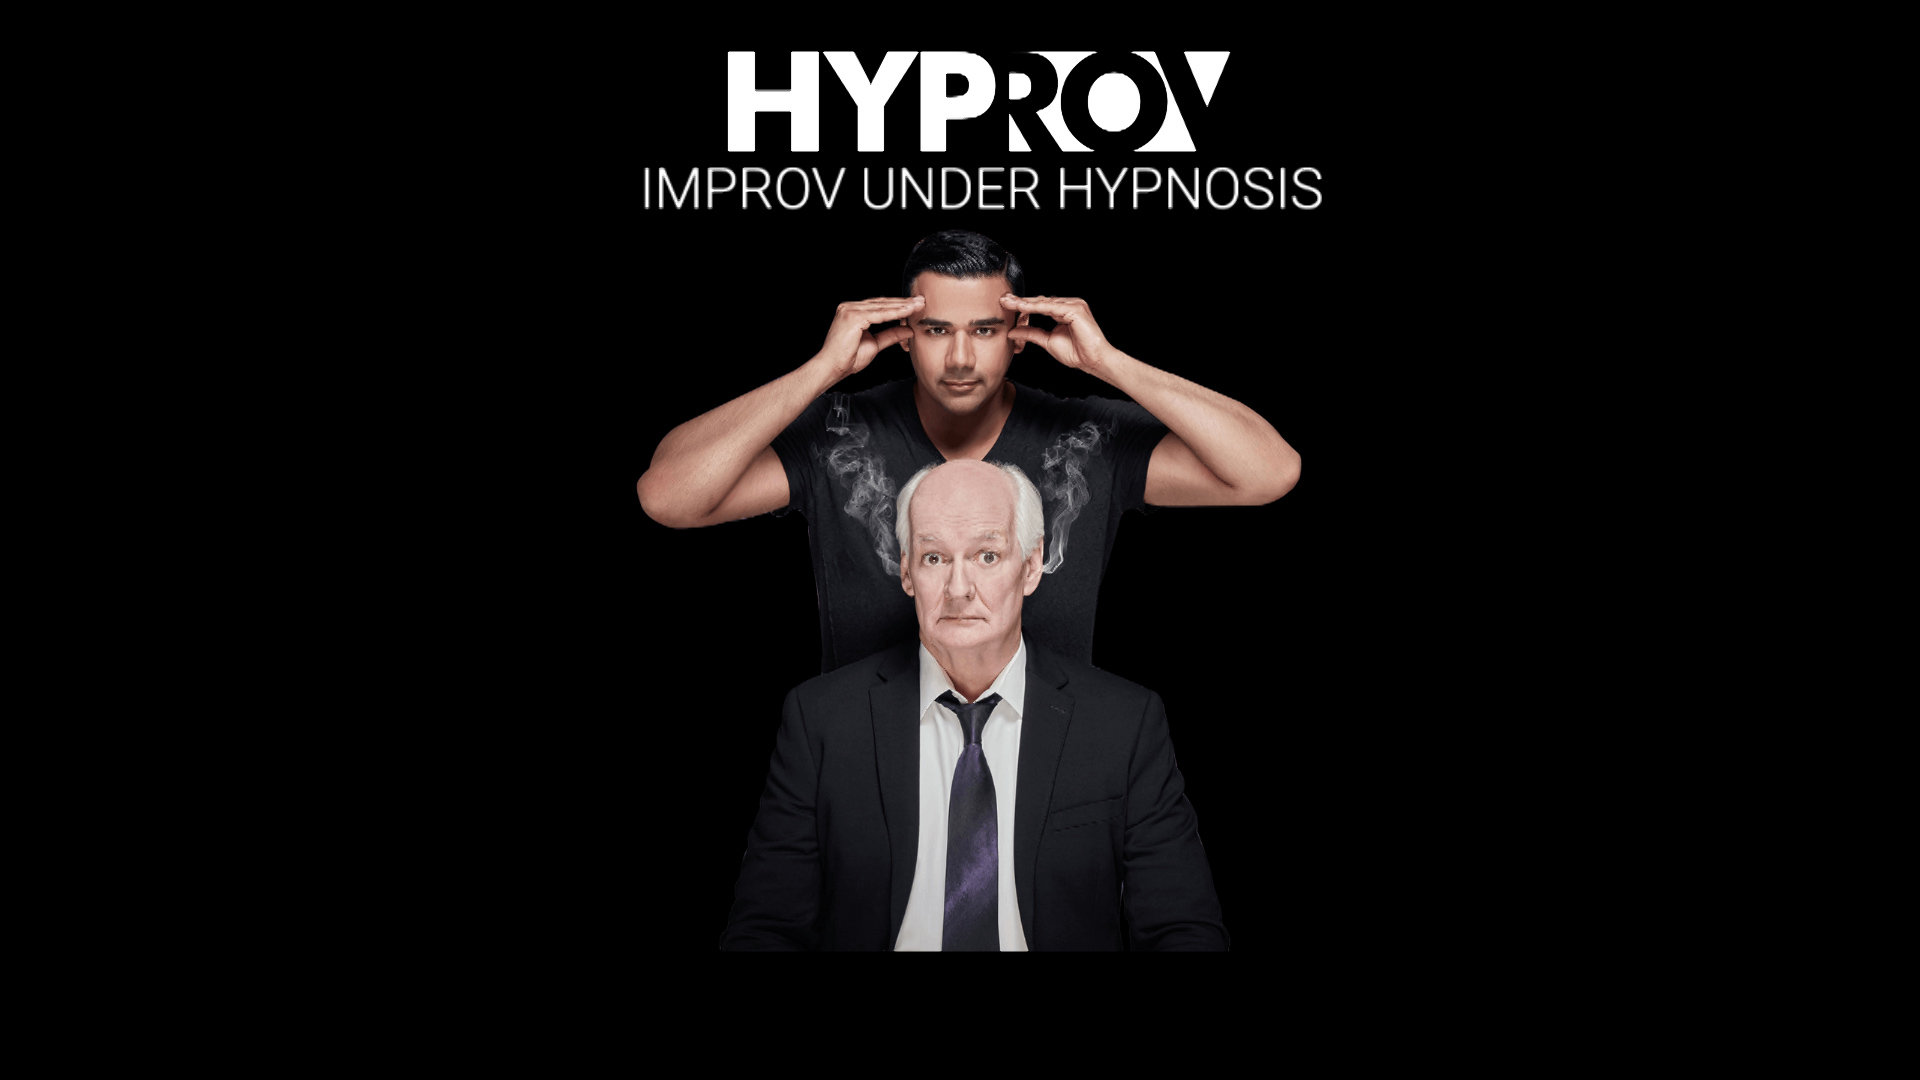 WOGB Welcomes HYPROV: Improv Under Hypnosis to the Ashwaubenon PAC!